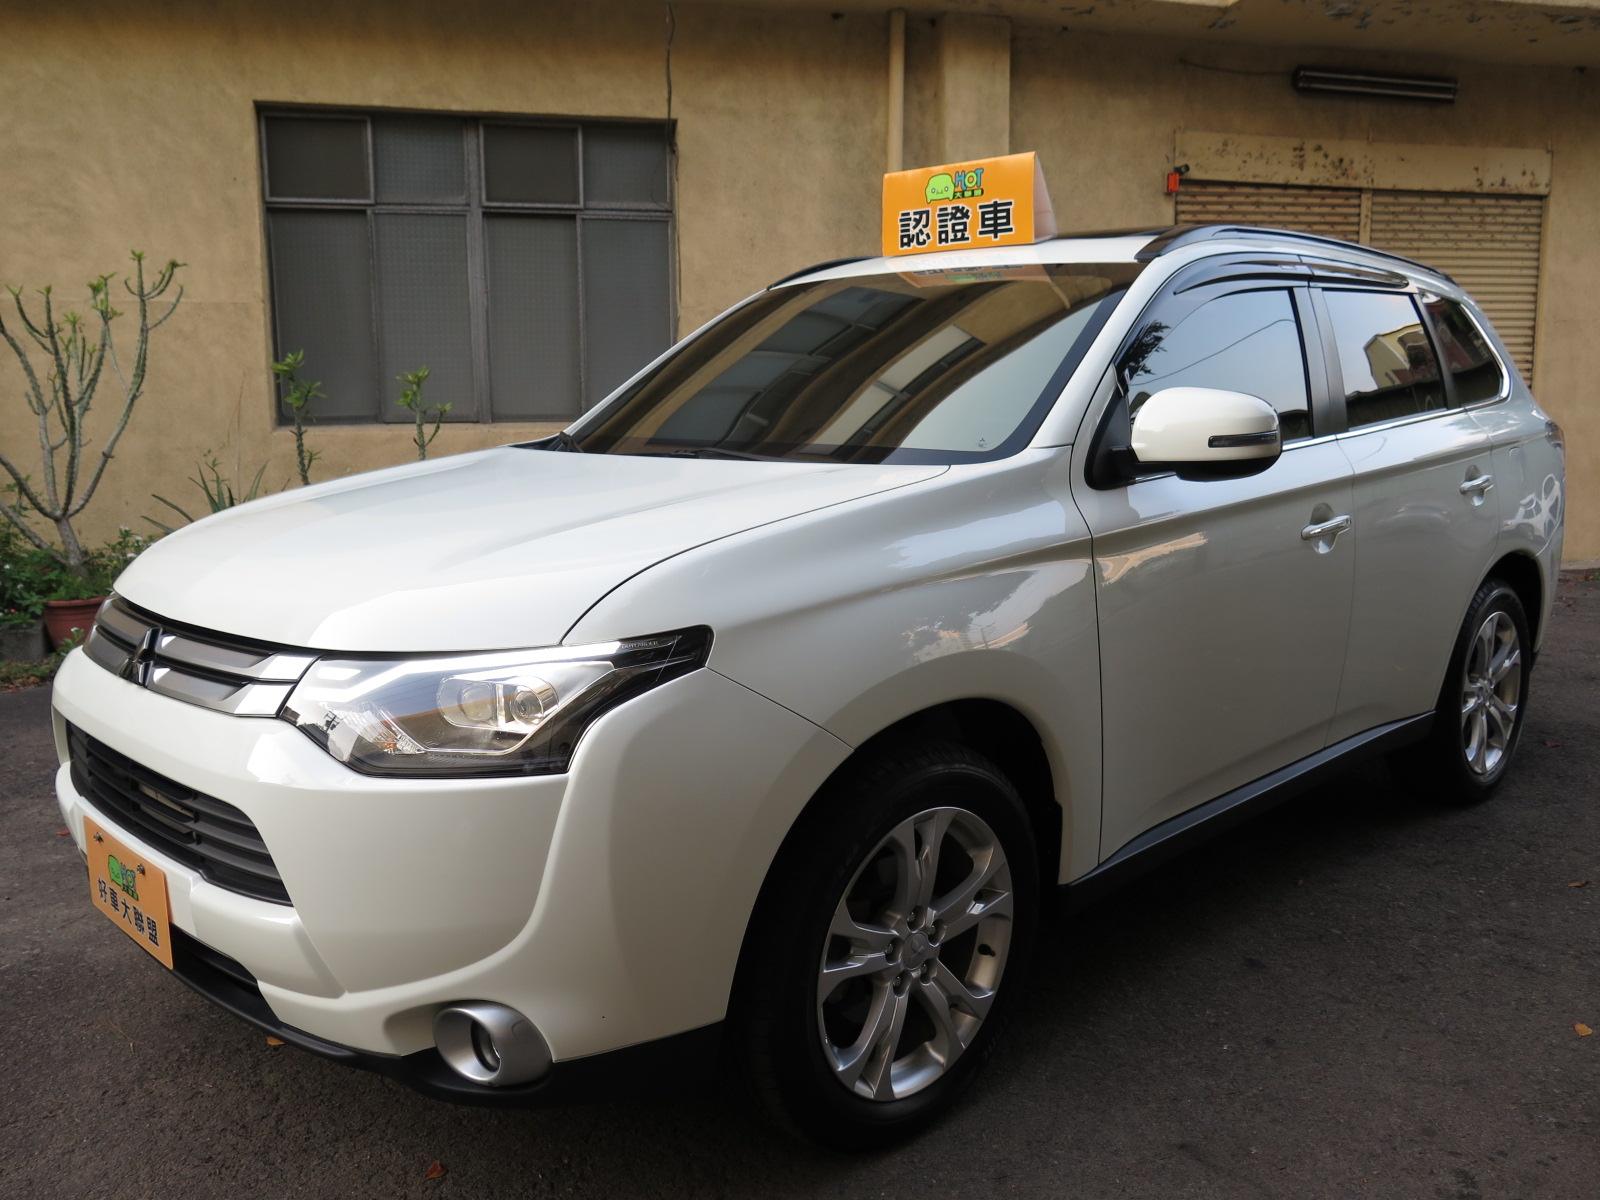 Mitsubishi(三菱) Outlander 15年4WD旗艦型天窗換檔撥片定速恆溫影音電尾門循跡新車107萬原板件原廠保固中 已通過HOT檢驗-認證車